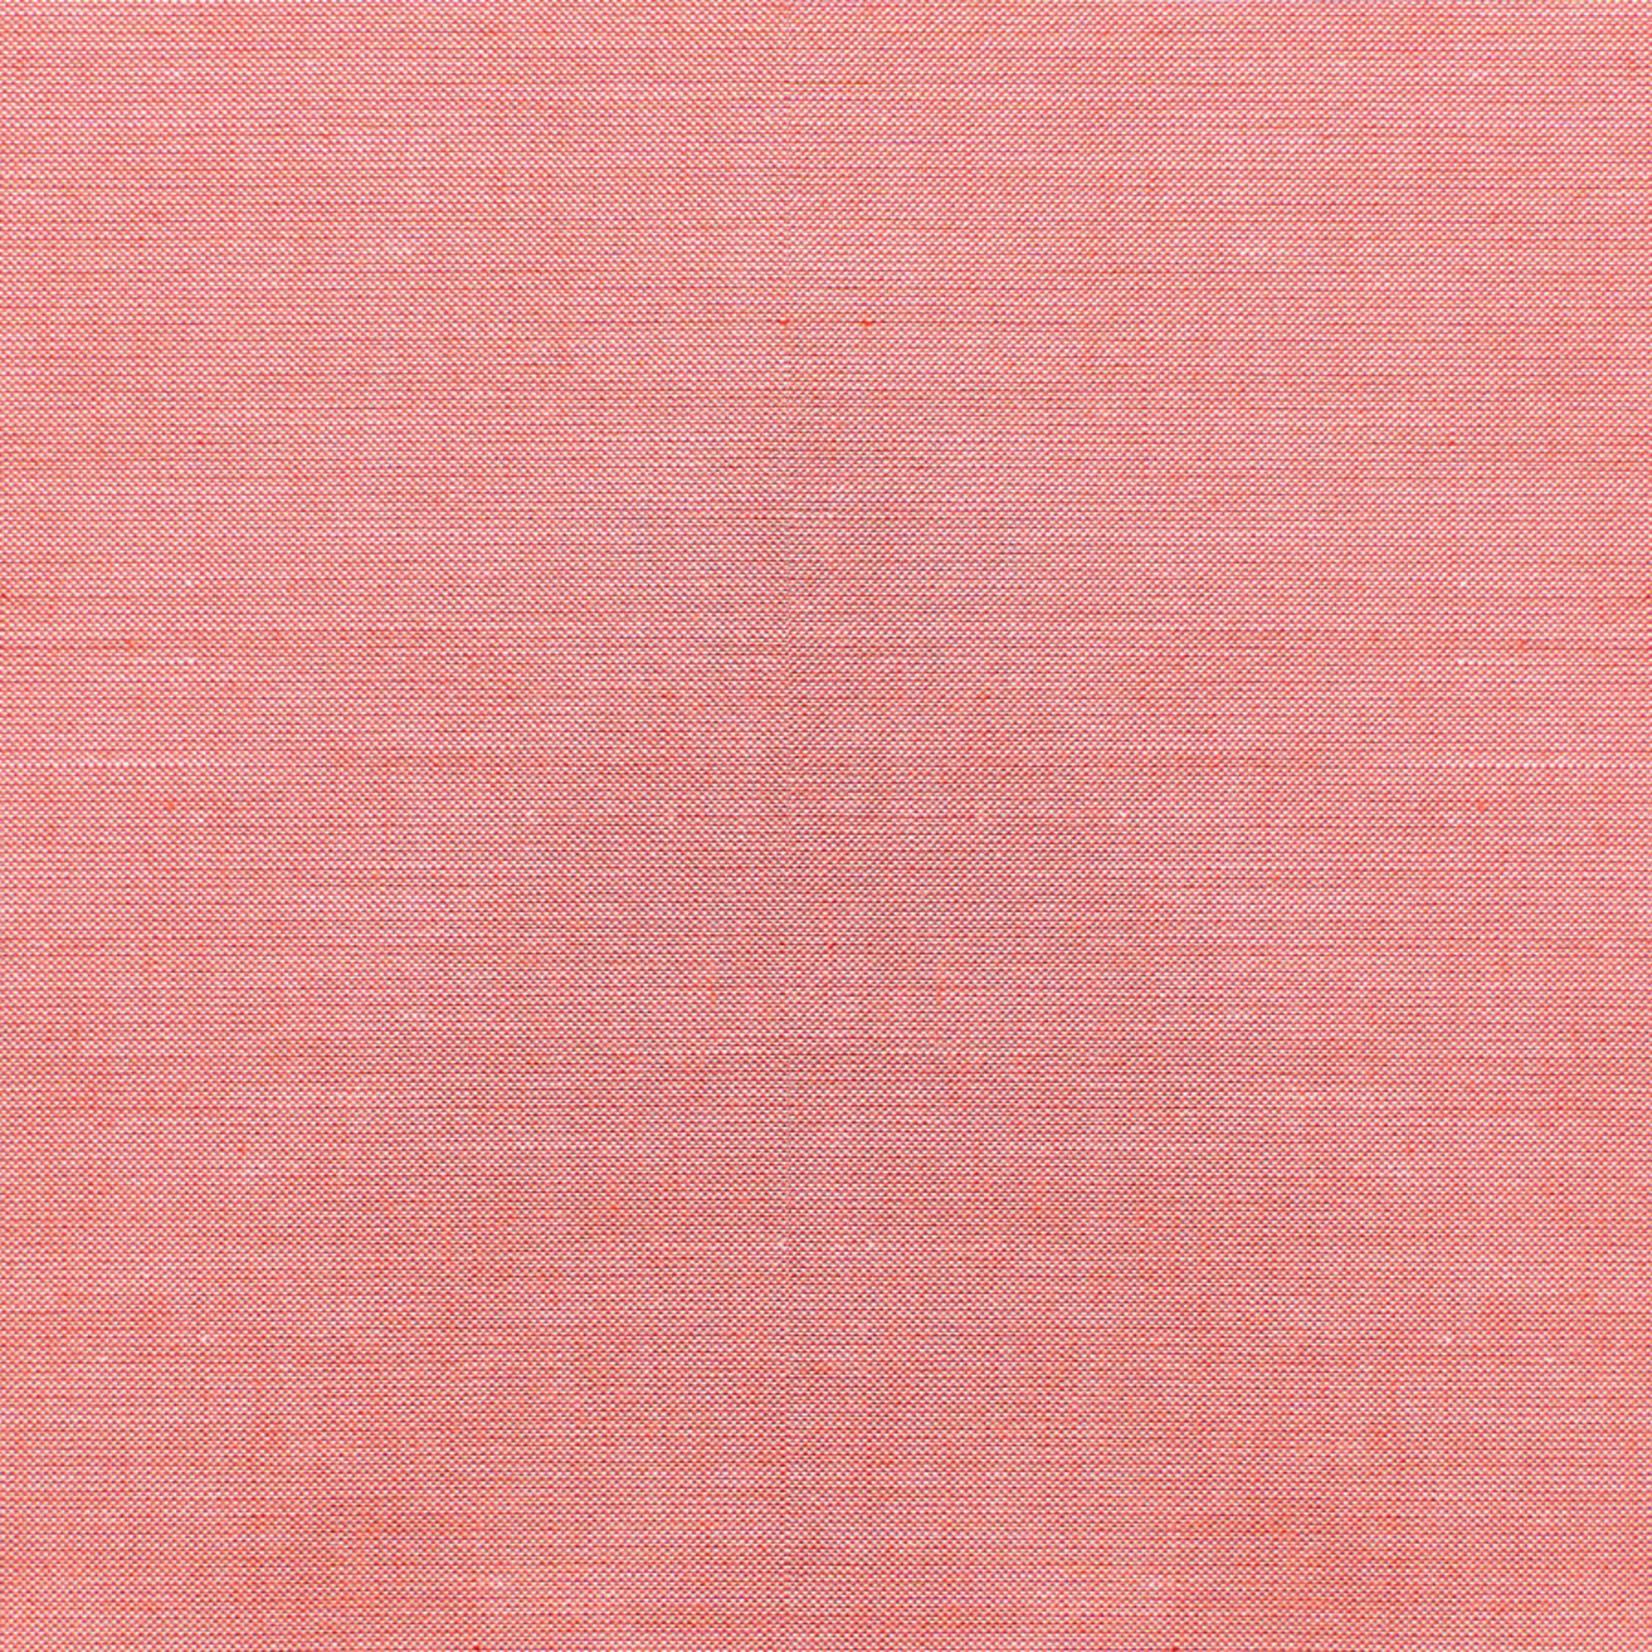 Tilda Gardenlife, Chambray, Coral 160014 $0.22 per cm or $22/m